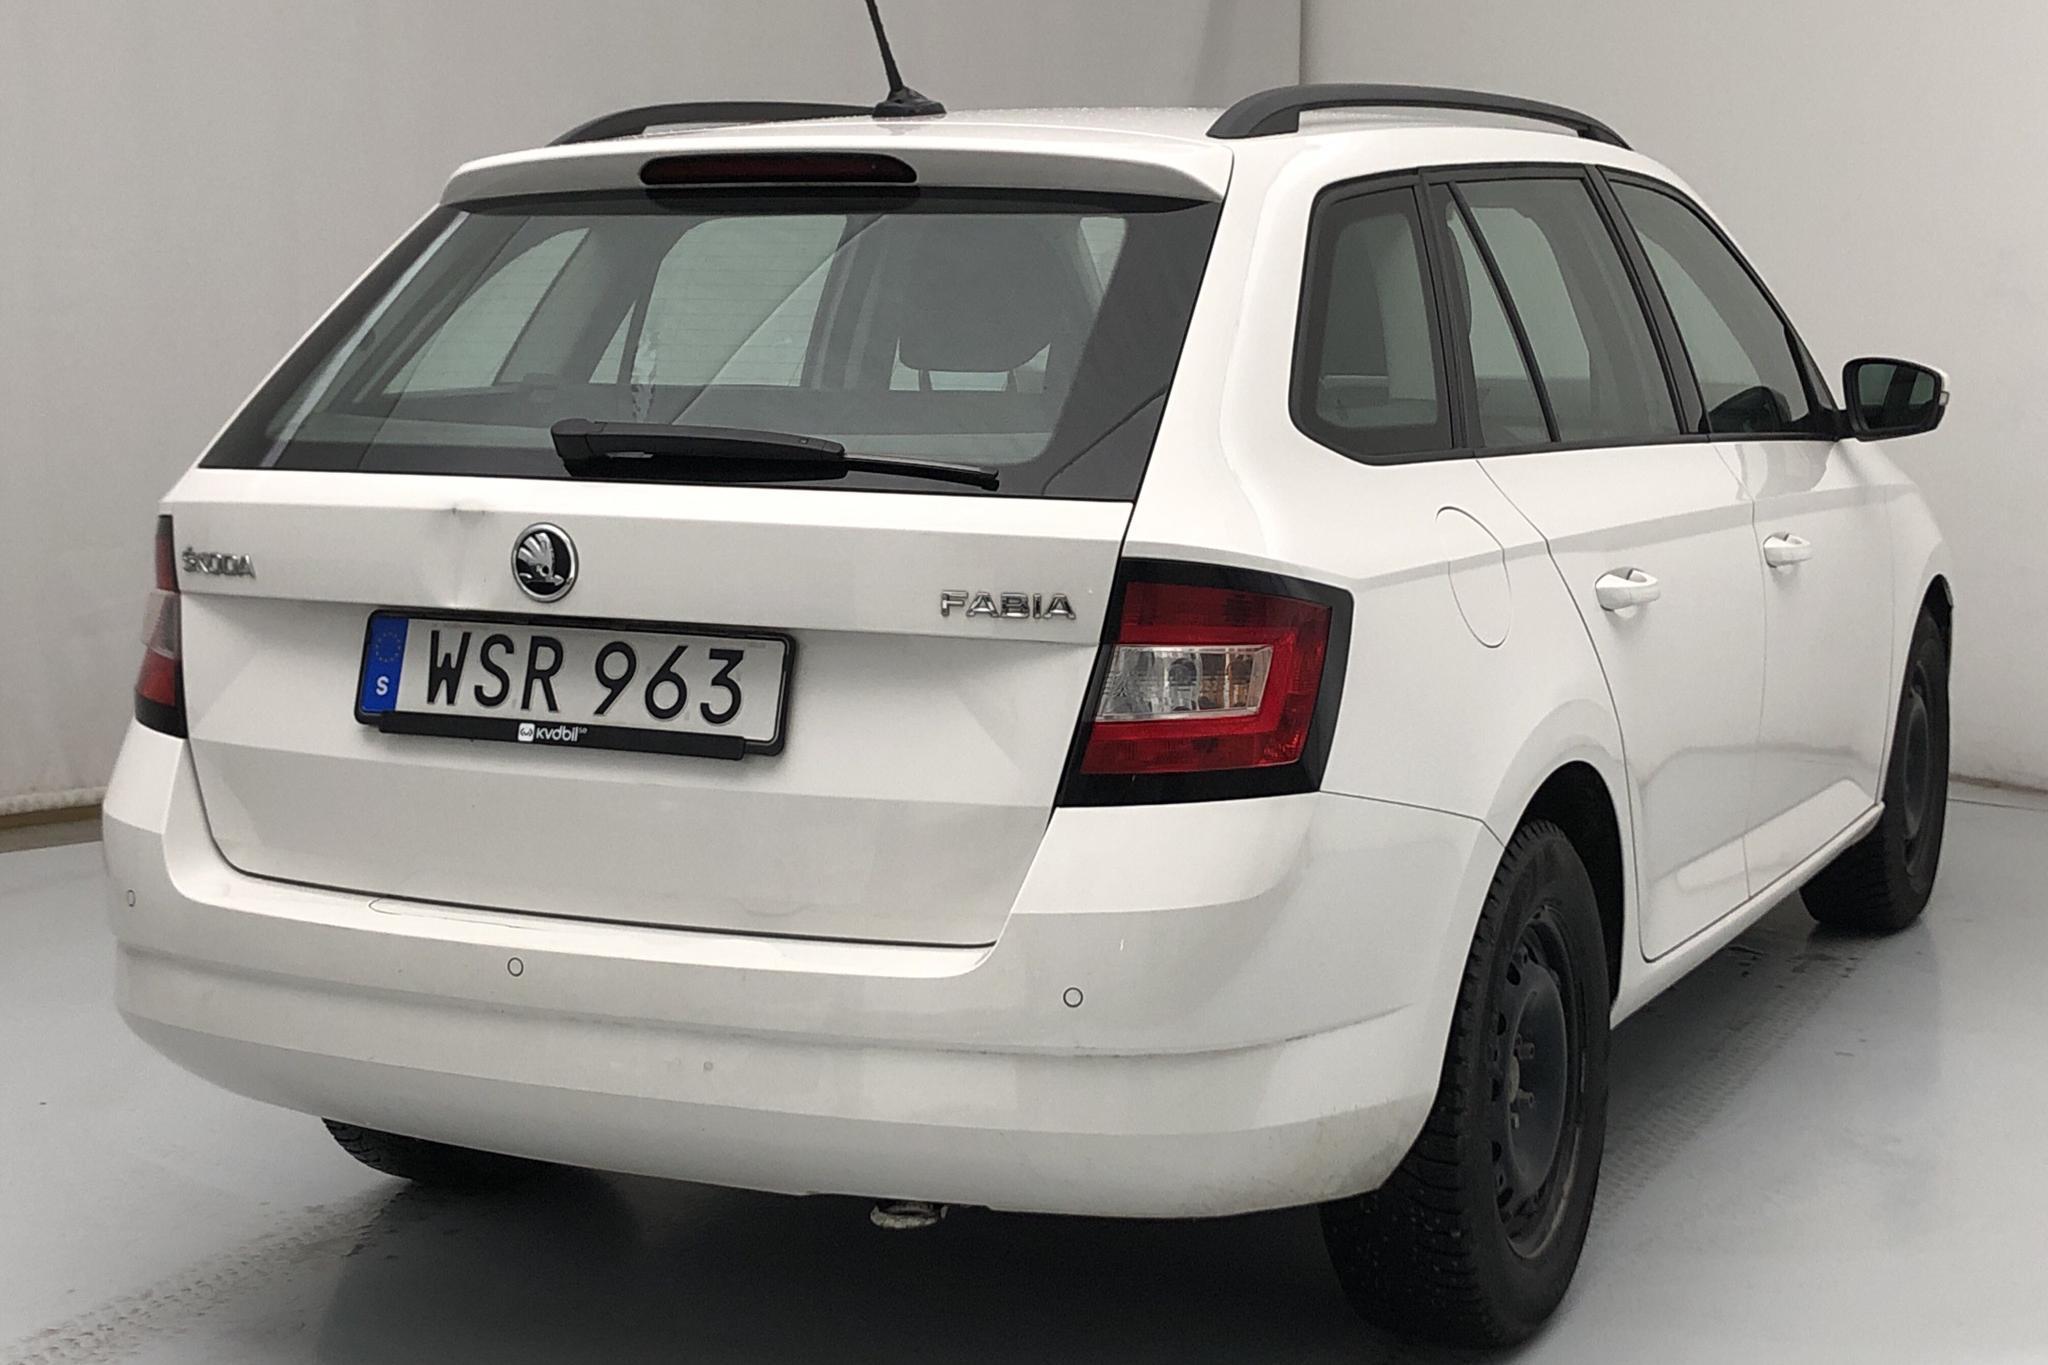 Skoda Fabia 1.0 TSI Kombi (110hk) - 198 270 km - Automatic - white - 2018